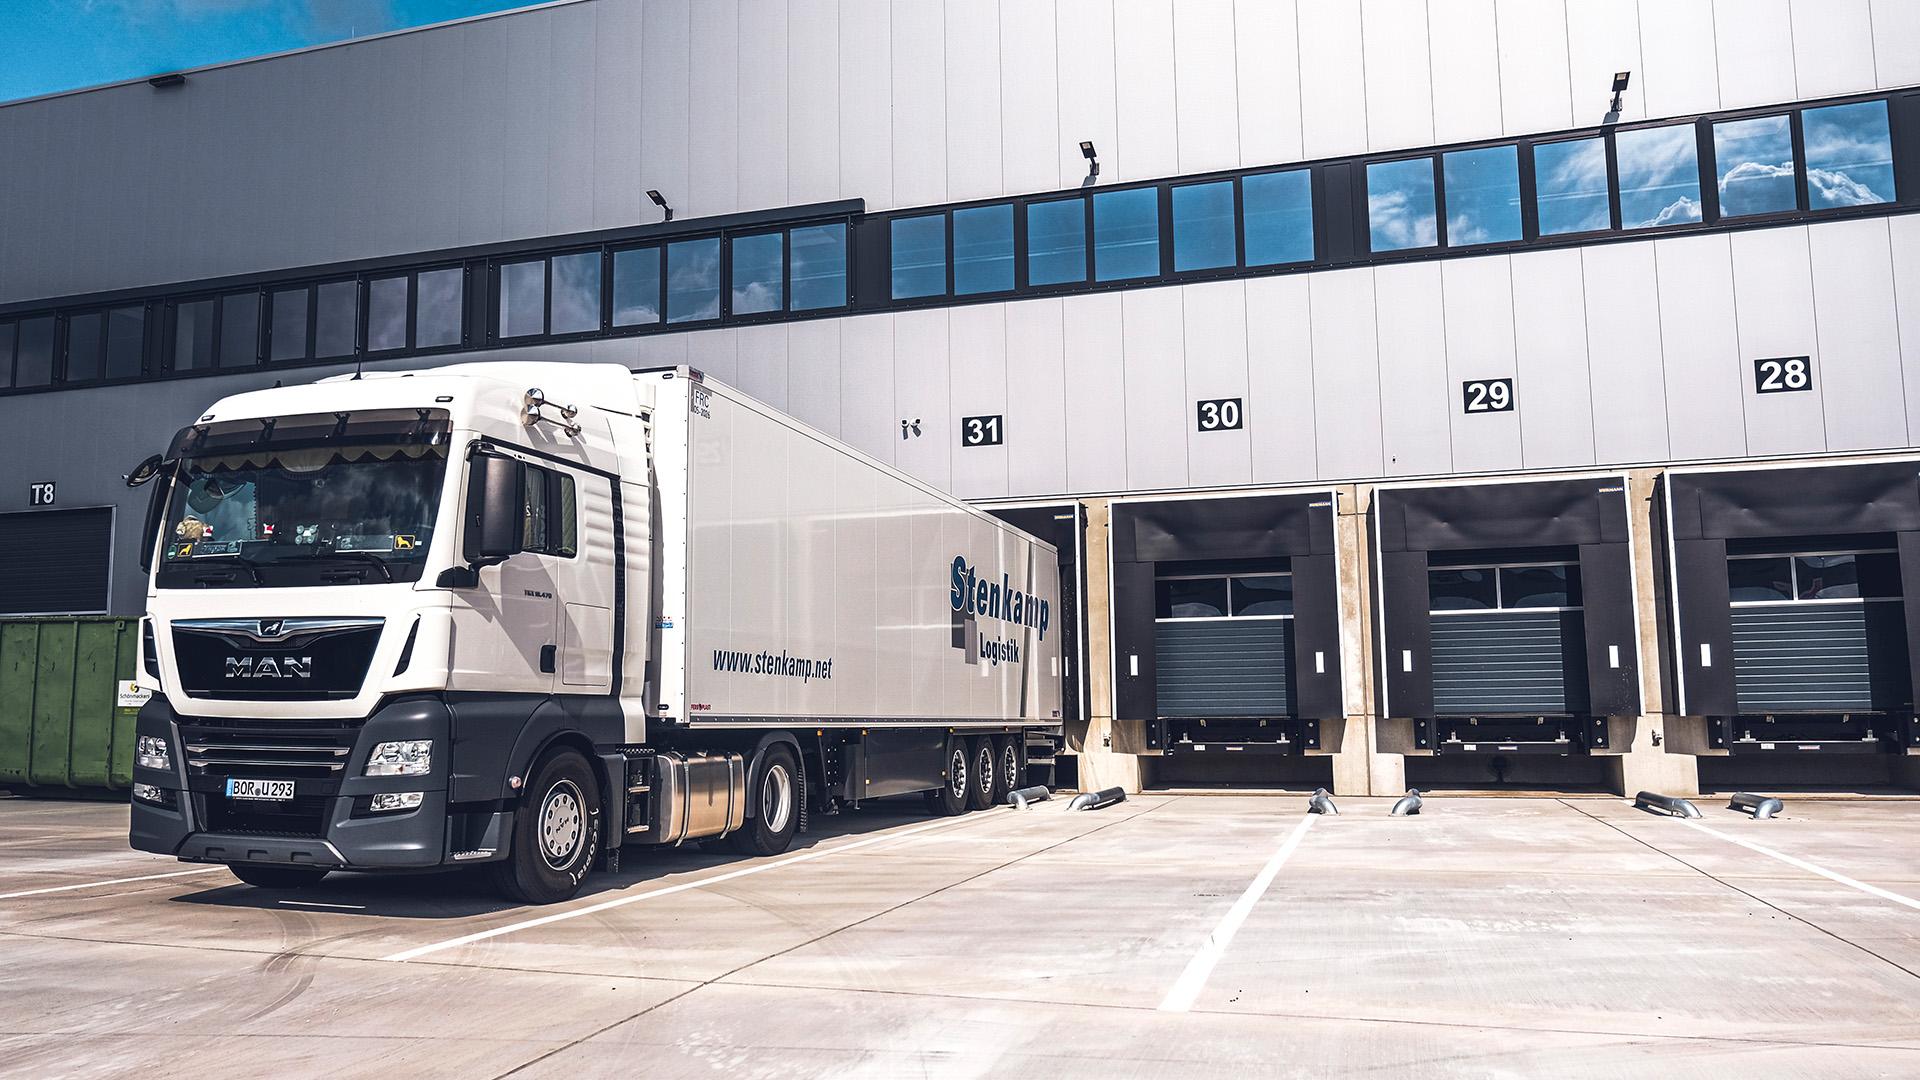 Stenkamp Logistik Dienstleister Borken Duisburg Lebensmittellogistik Lagerung Transport